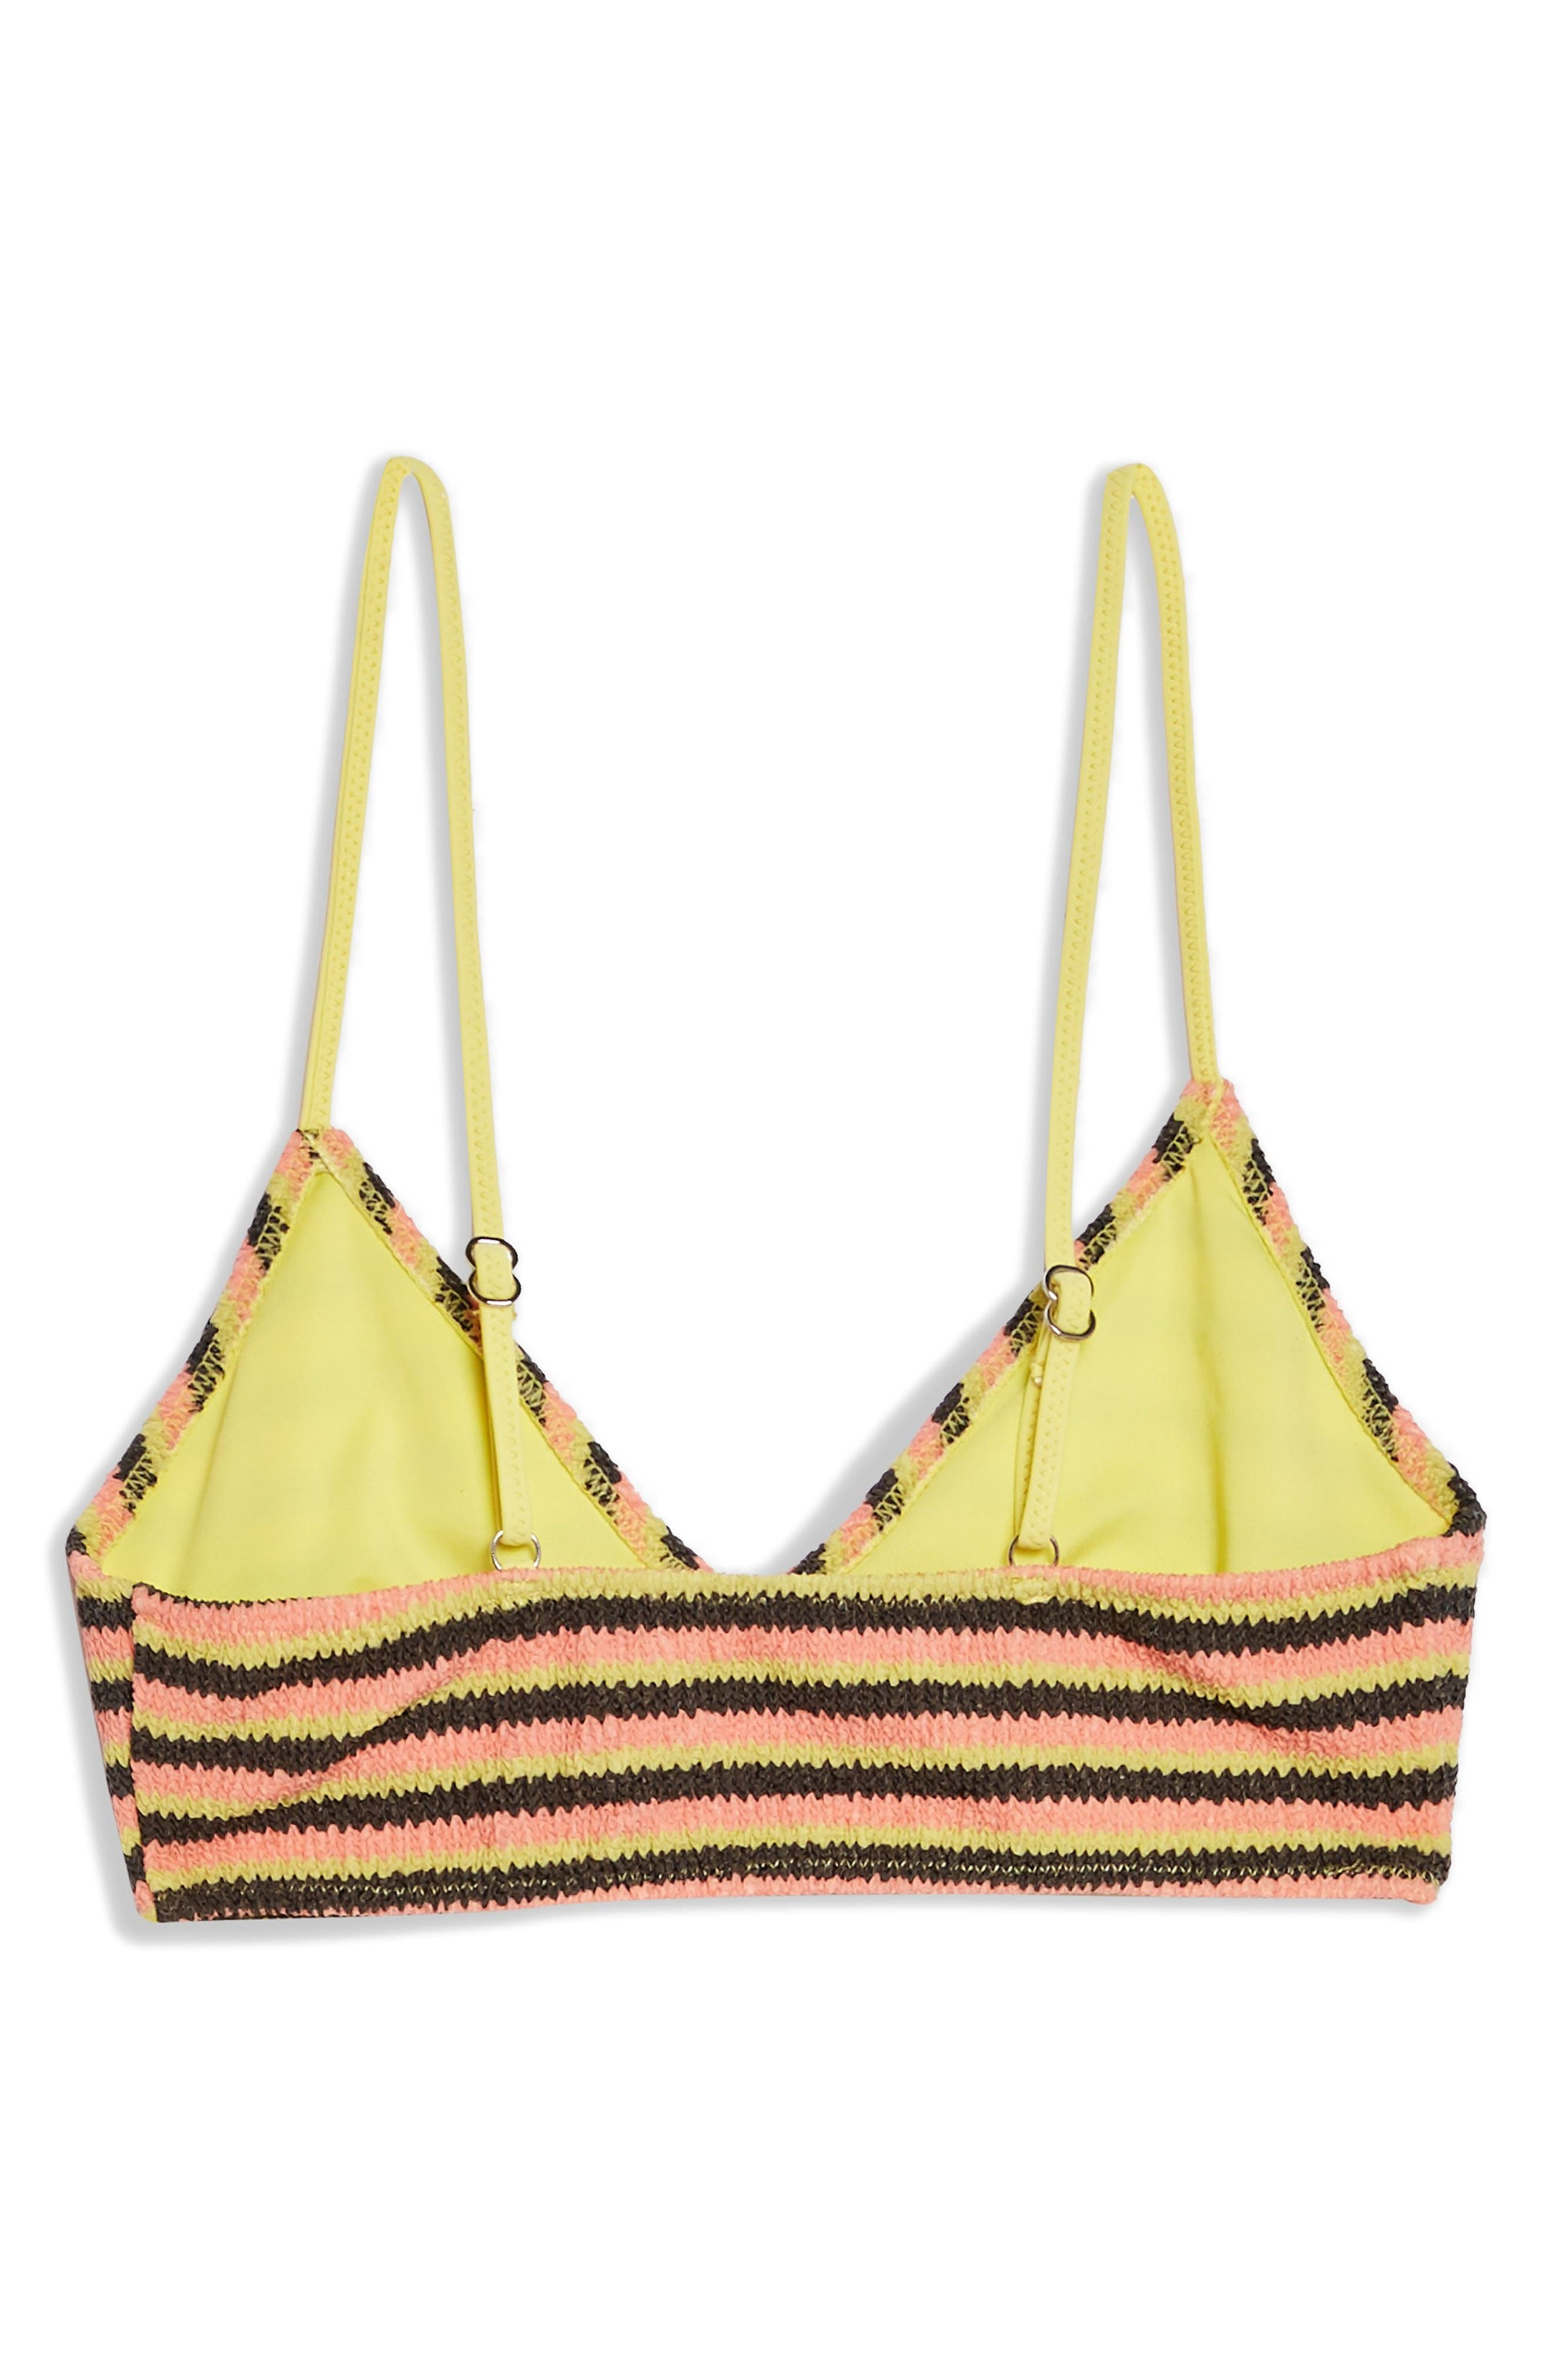 TOPSHOP, Textured Stripe Bikini Top, Alternate thumbnail 5, color, YELLOW MULTI